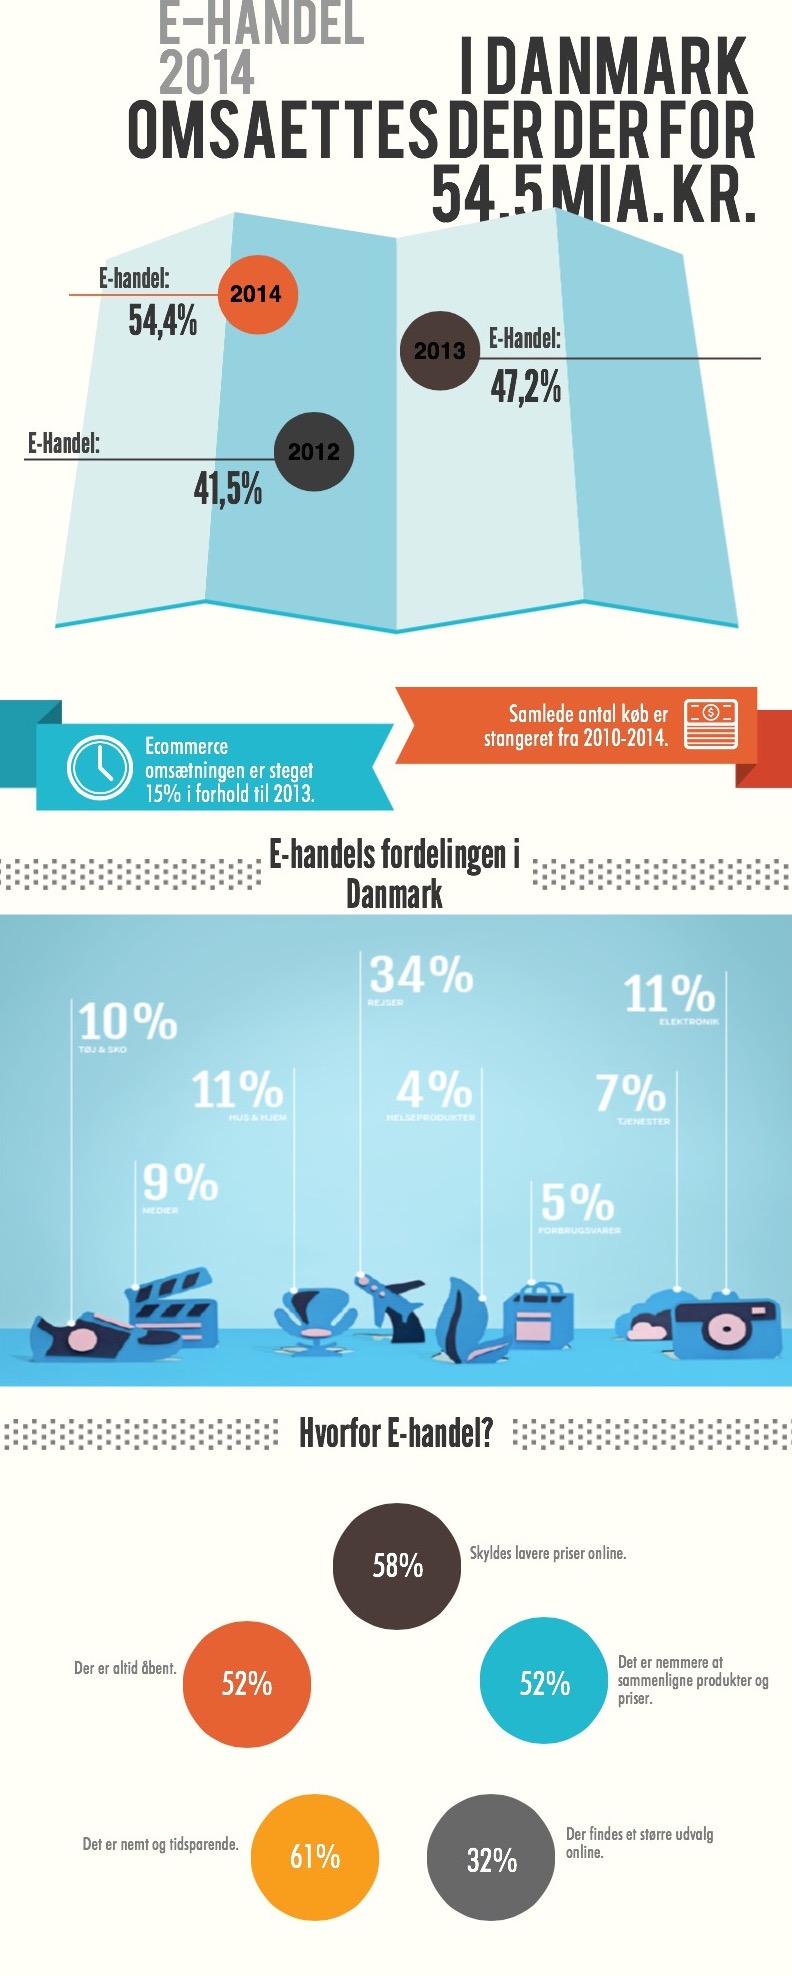 E-handel 2014.